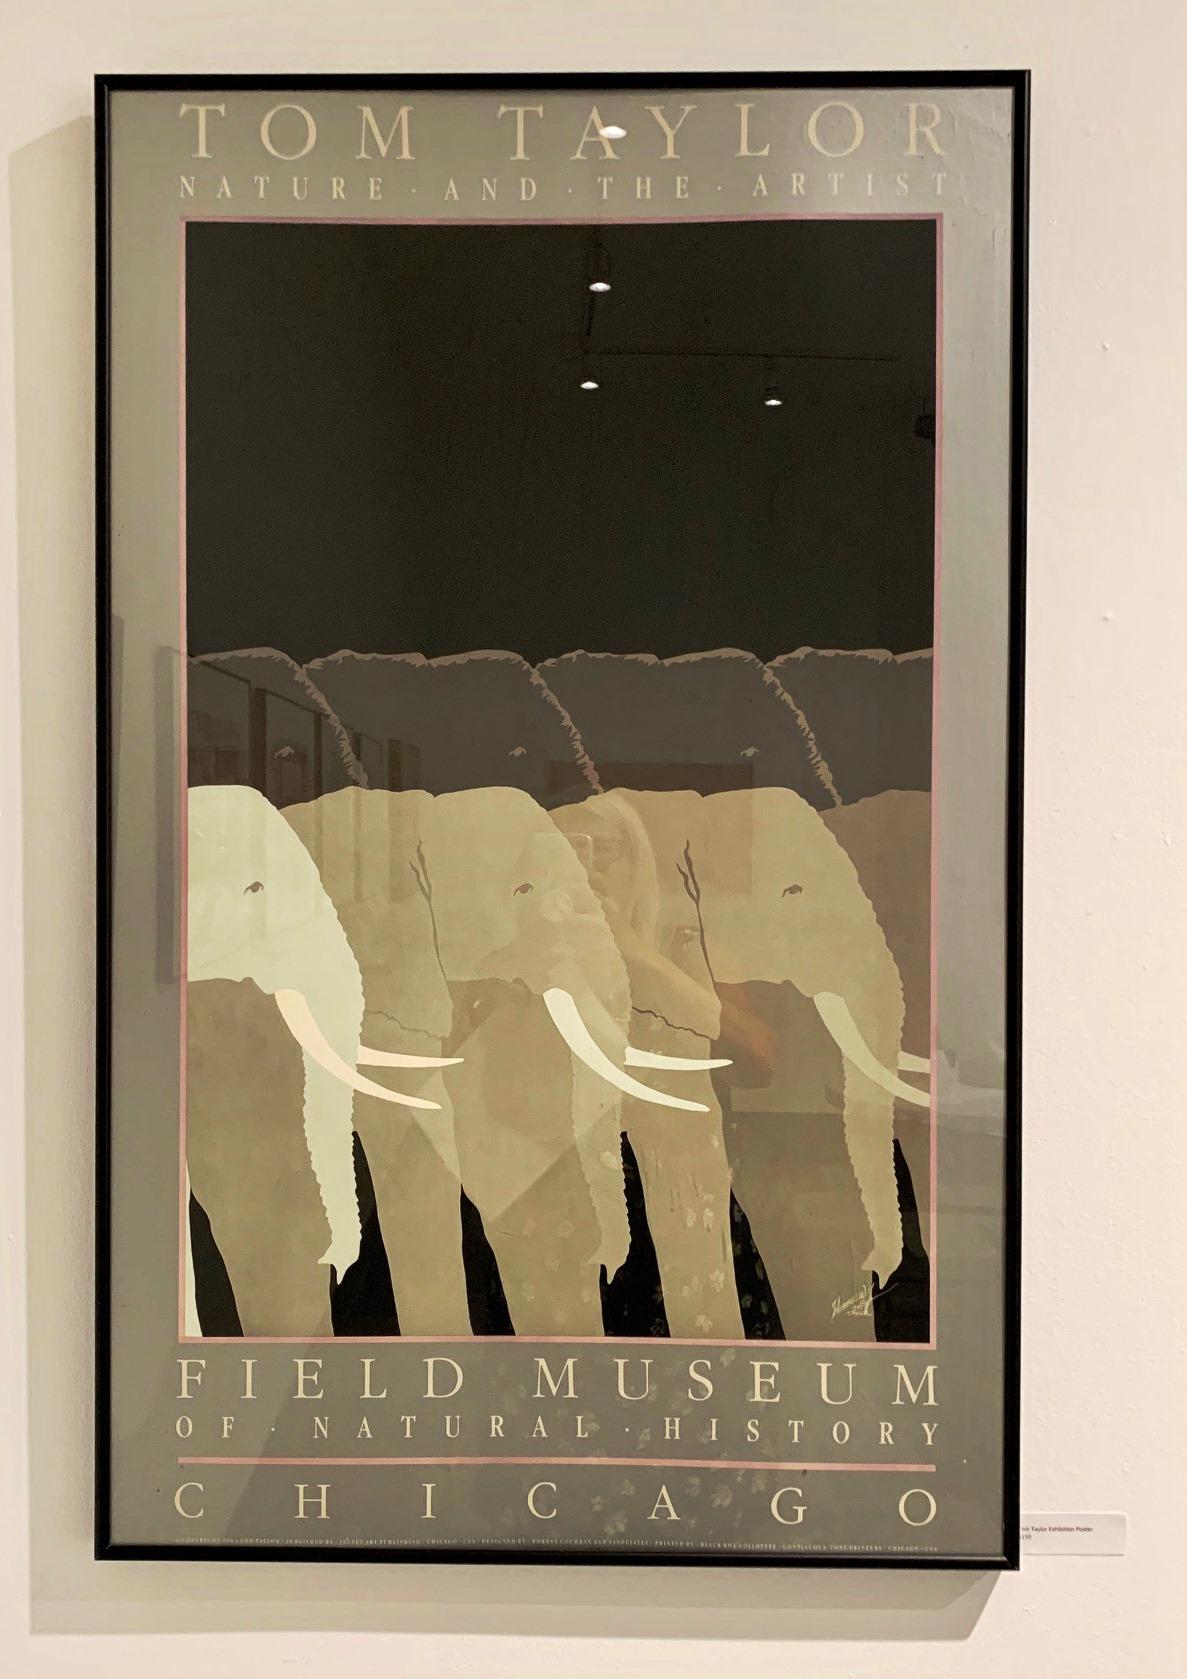 Tom Taylor exhibition poster framed $150 pick up only